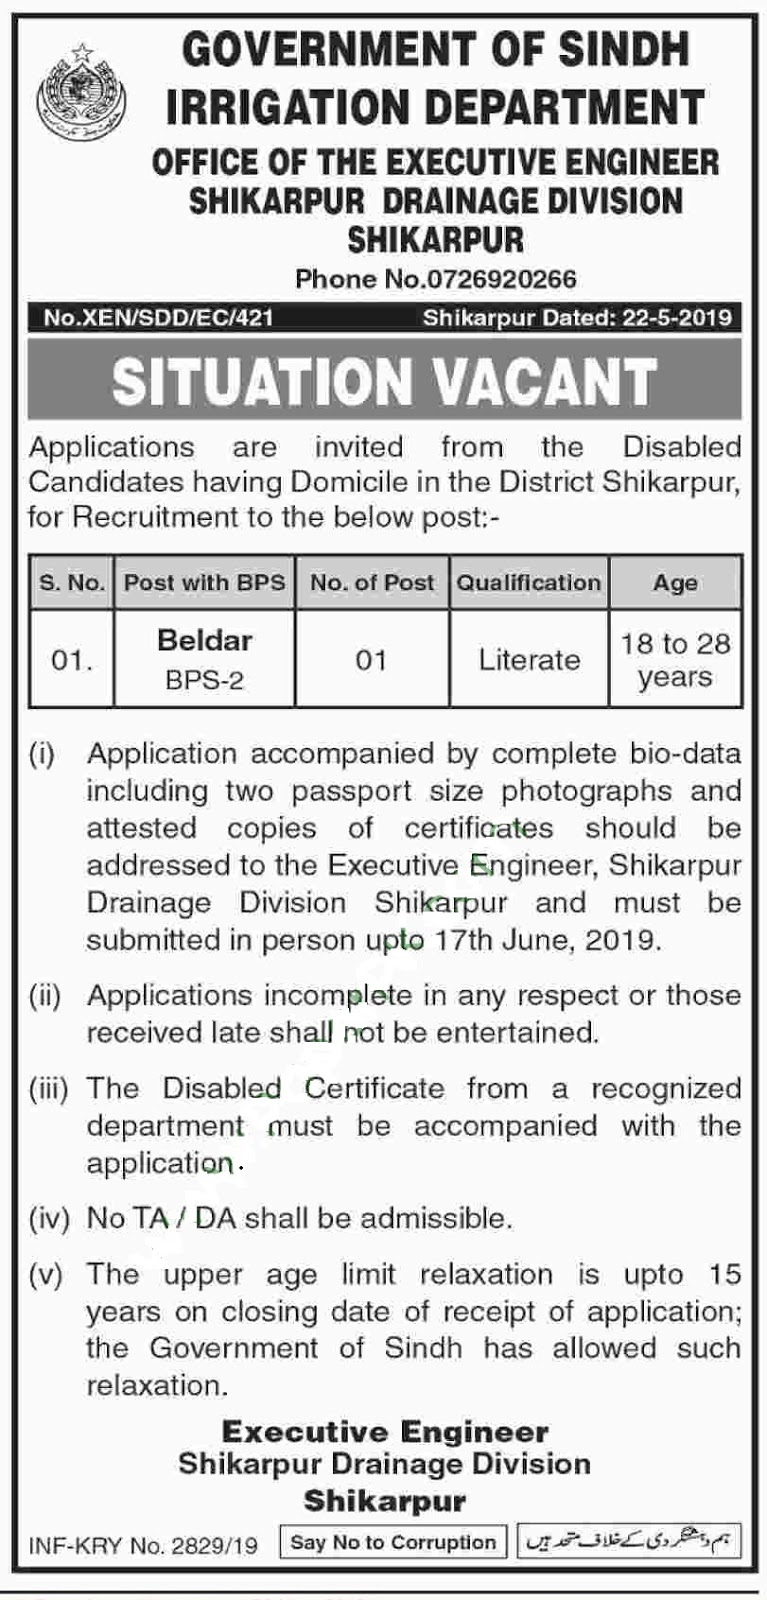 irrigation department,irrigation jobs 2019,irrigation department jobs,irrigation department jobs 2019,jobs in sindh 2019,latest jobs in pakistan